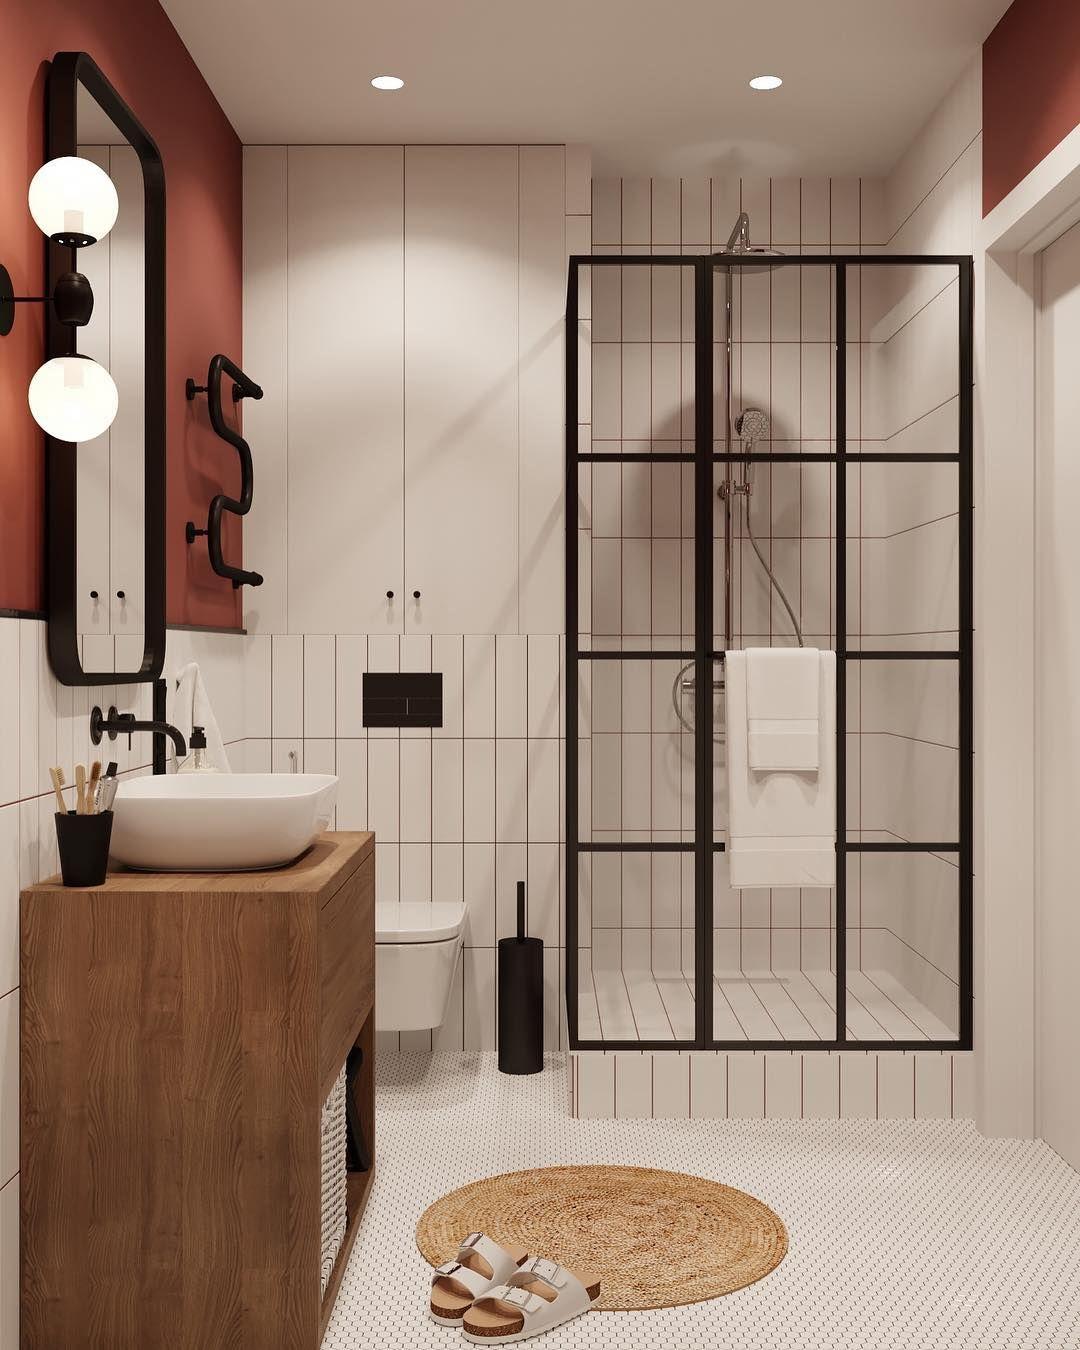 #modernpowderrooms